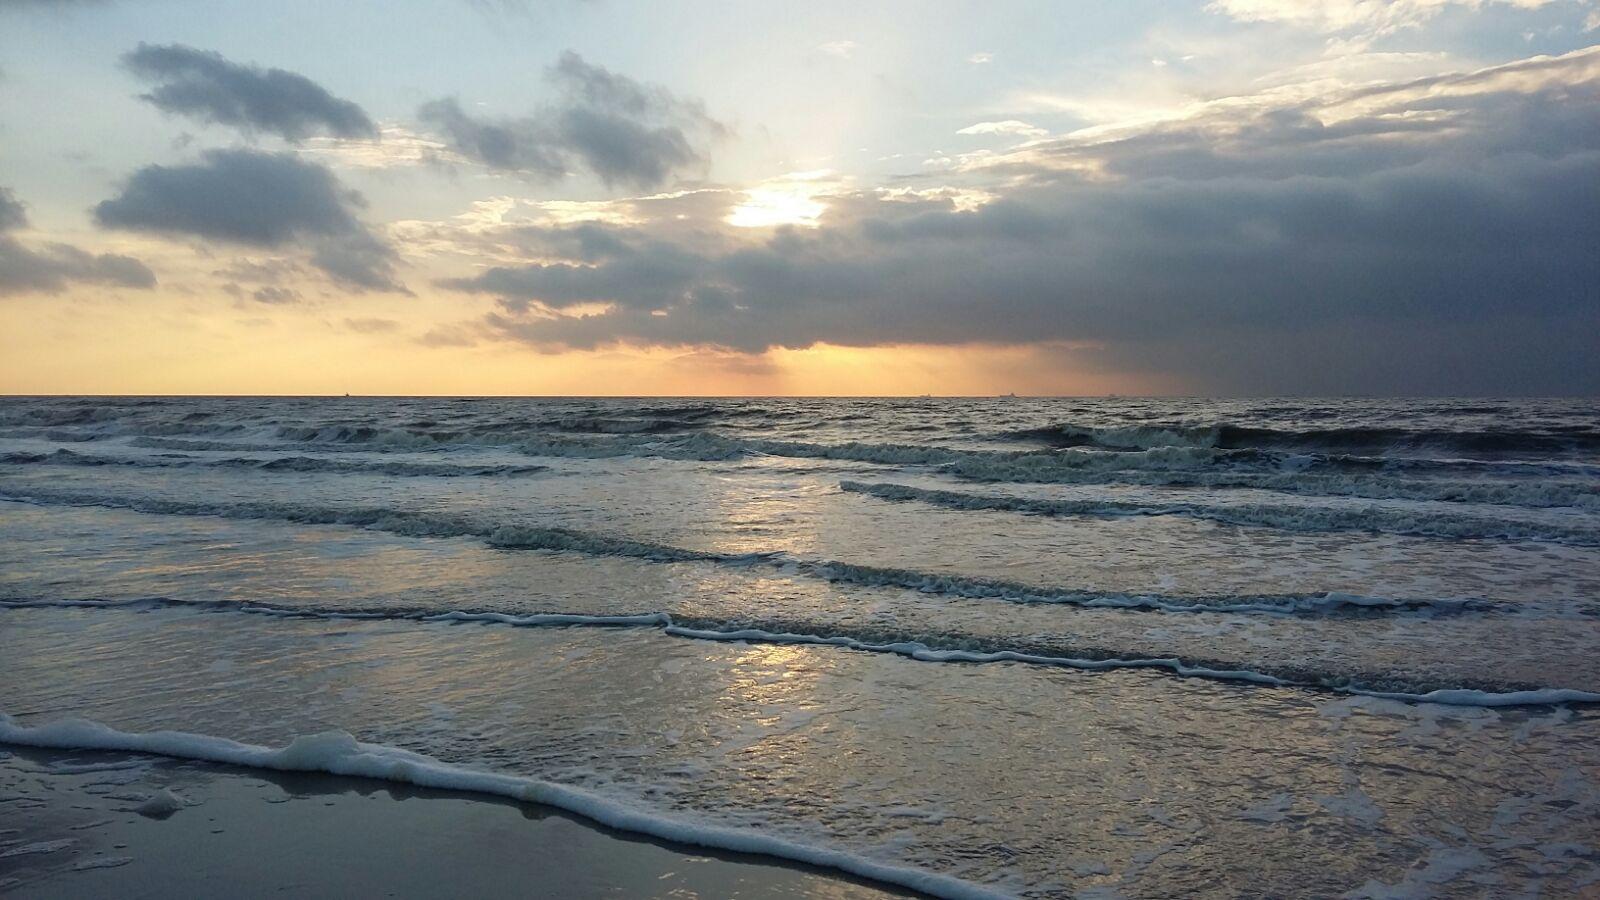 Sonnenuntergang. Wie gemalt.